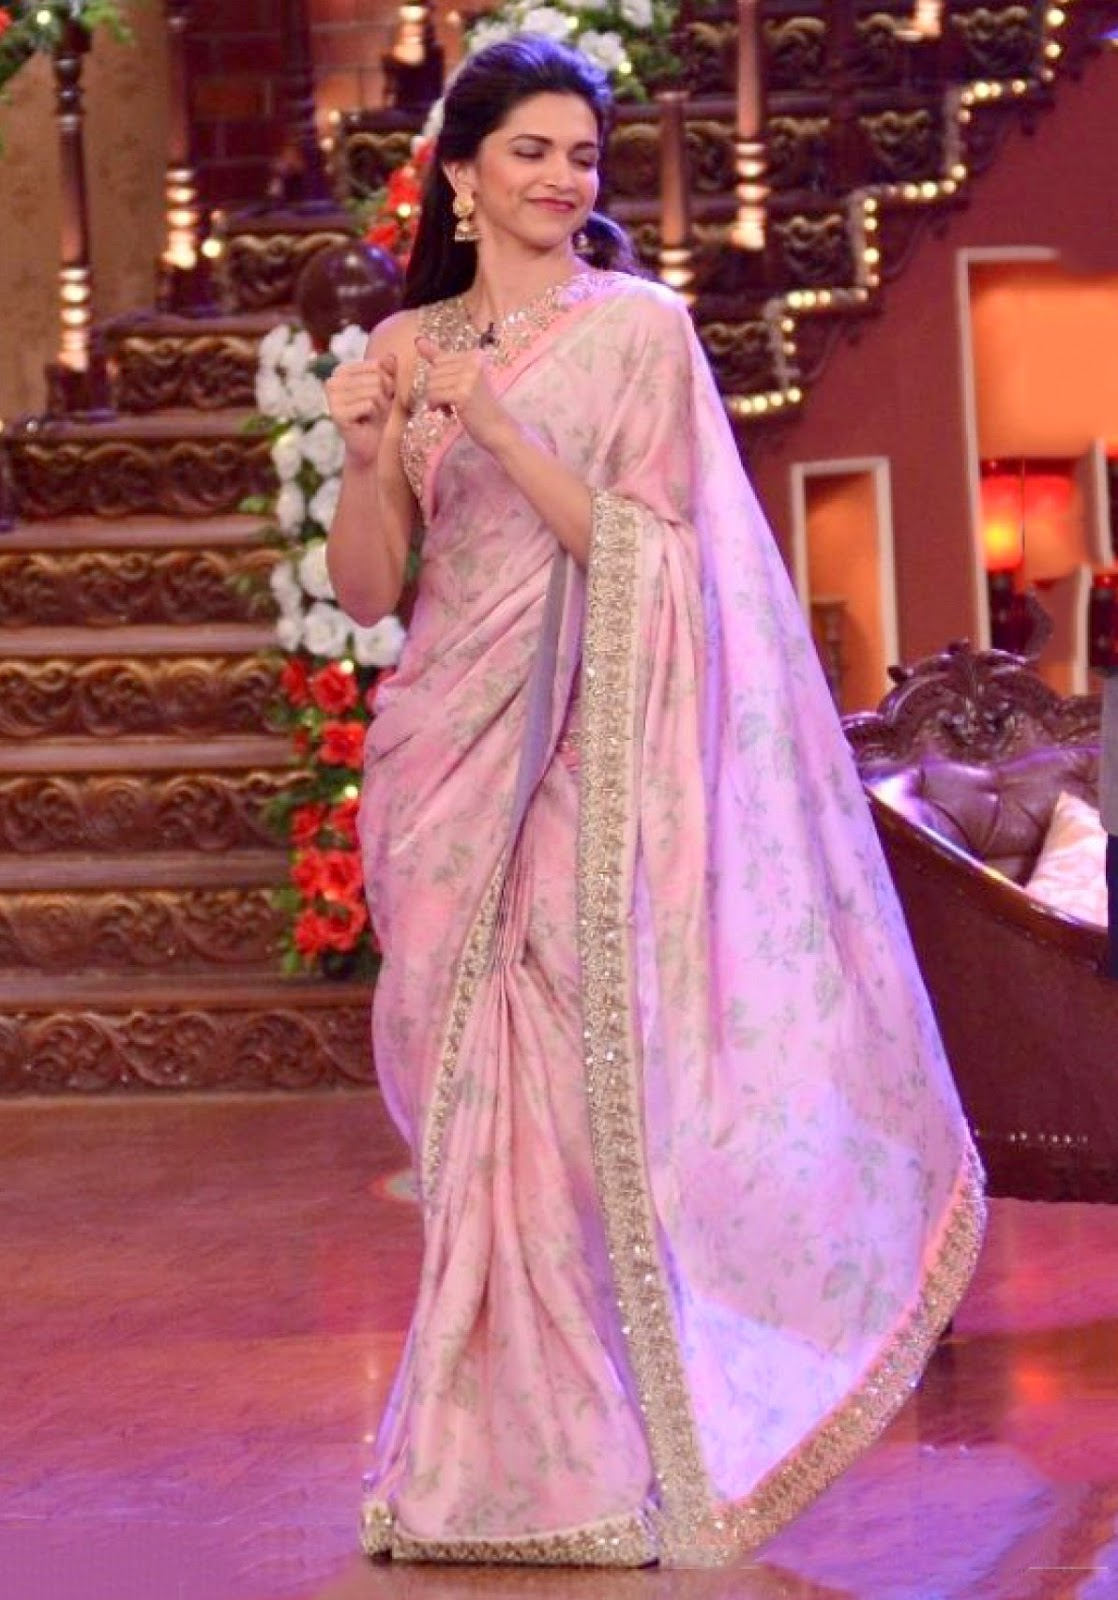 Deepika Padukone in saree, festive, fashion blog, Chamber of Beauty blog